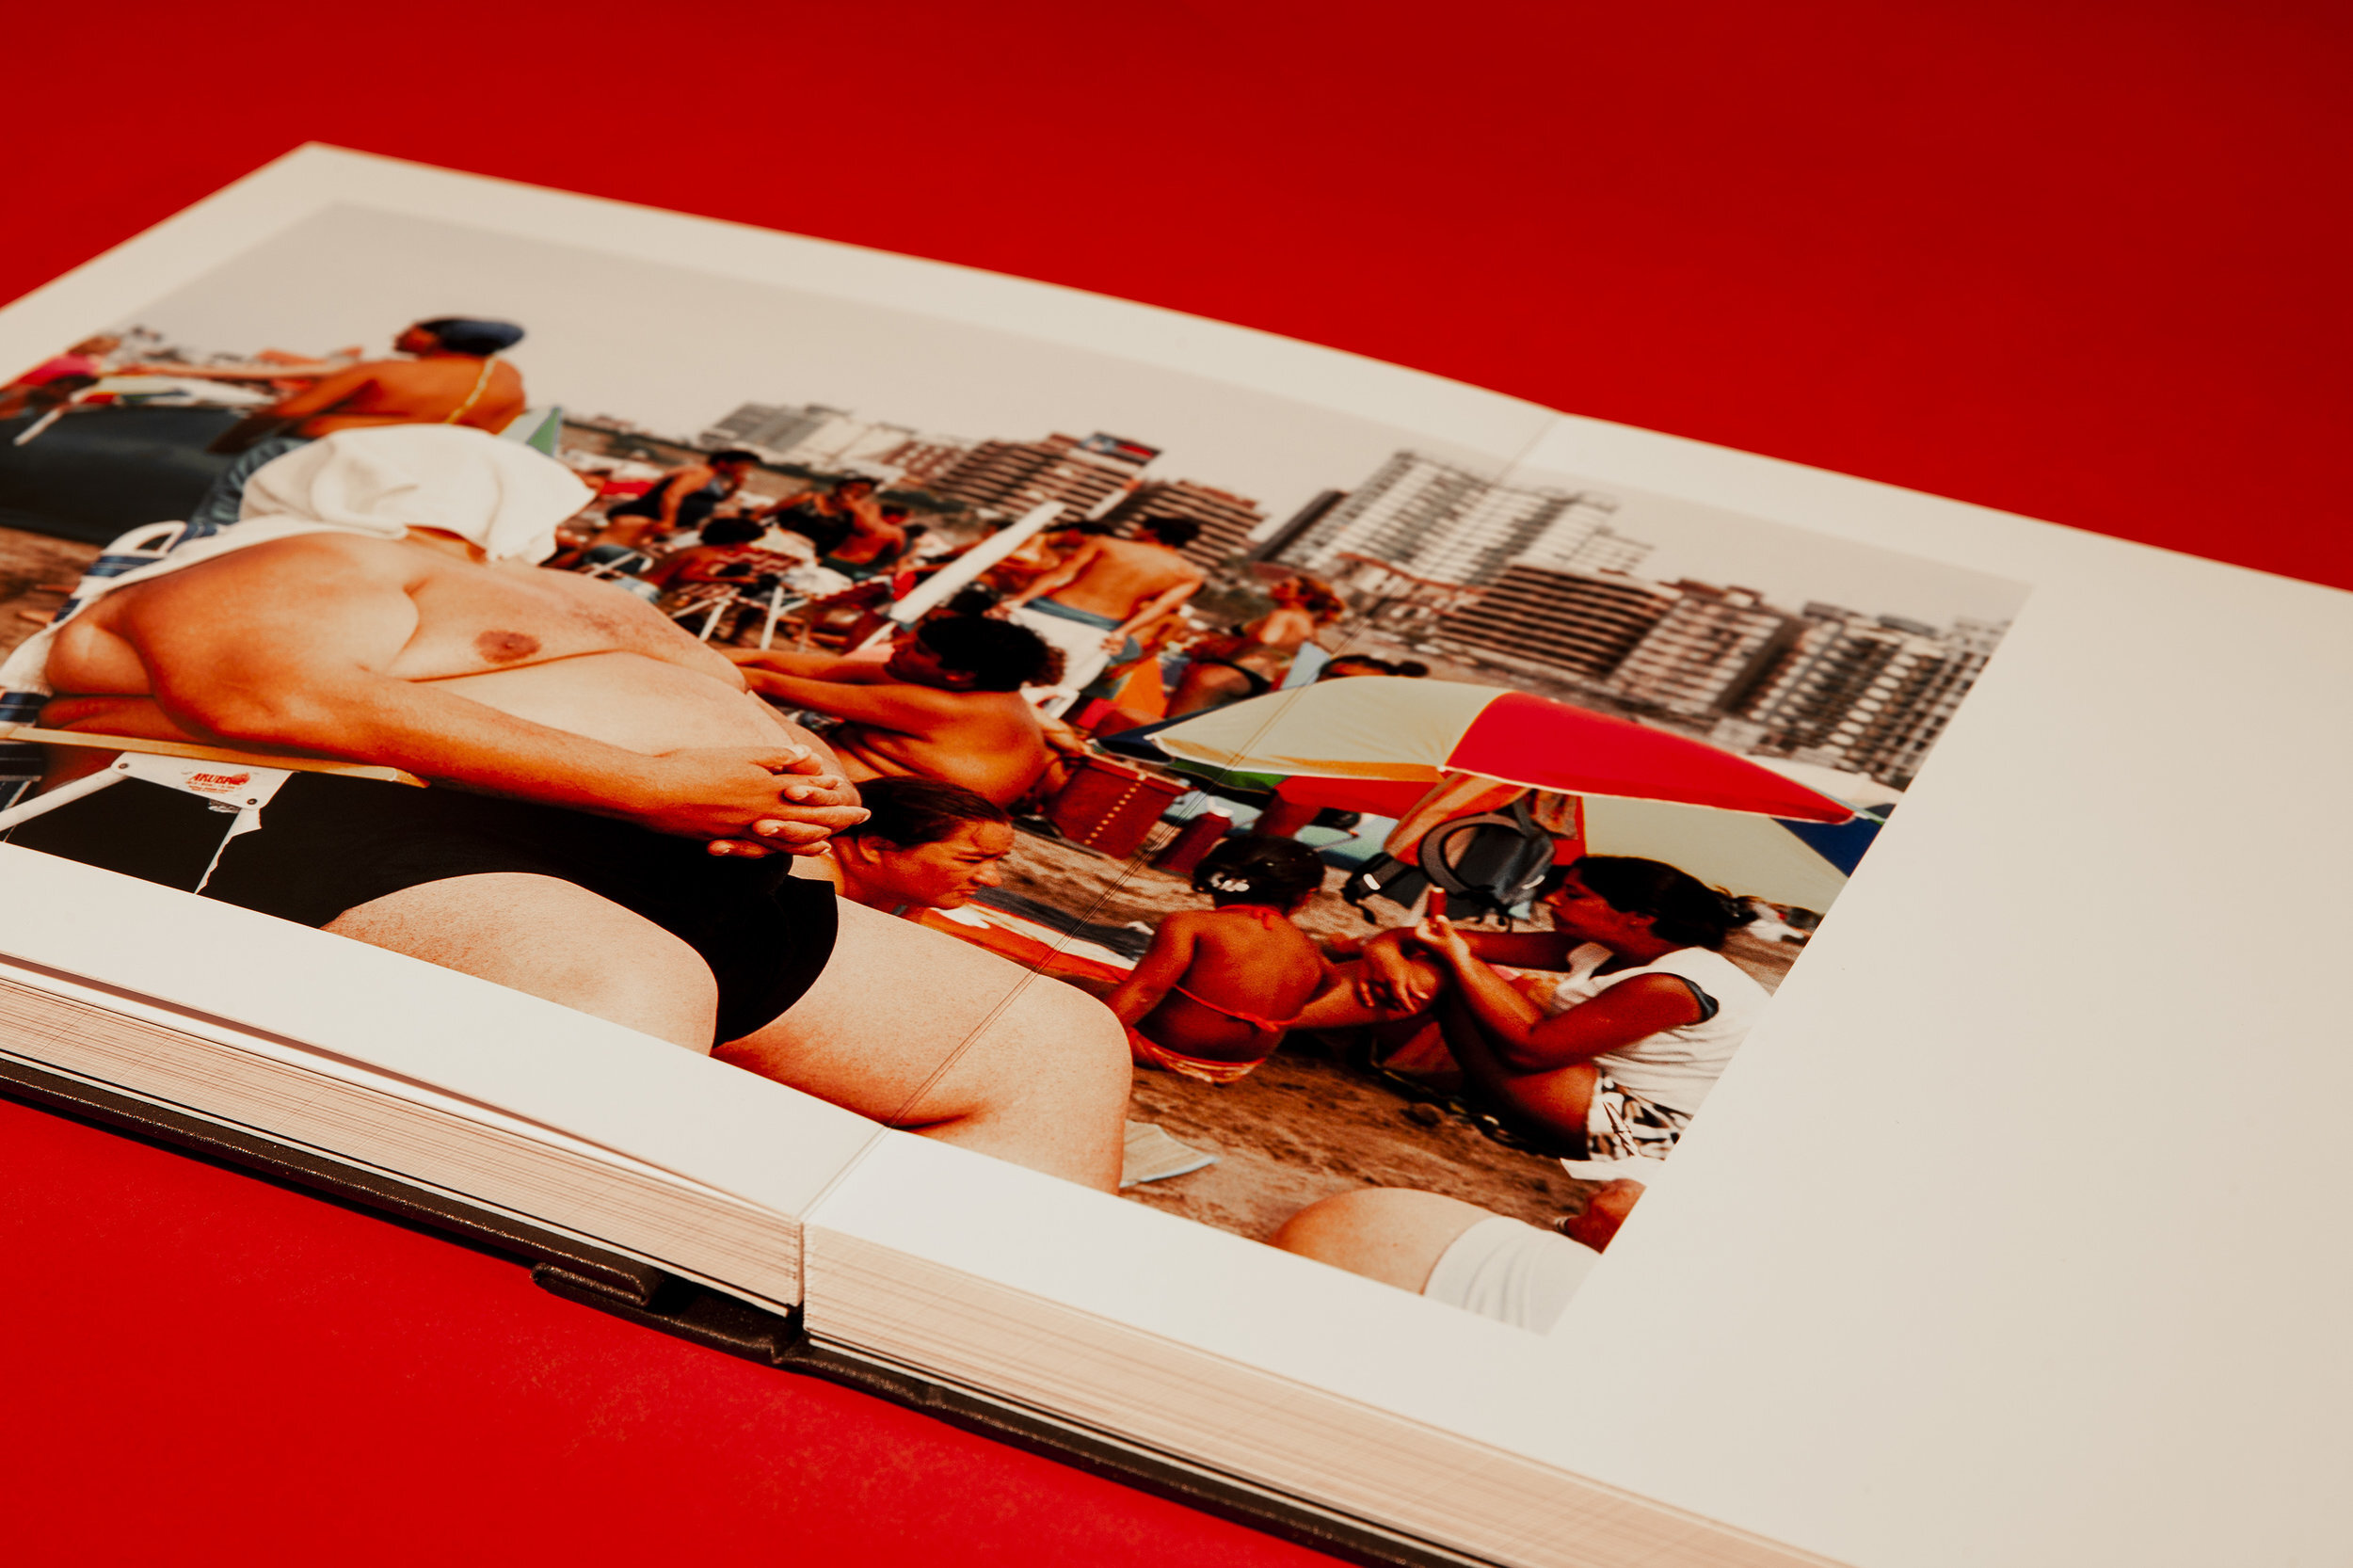 magnum-by-magnum-book9.jpg